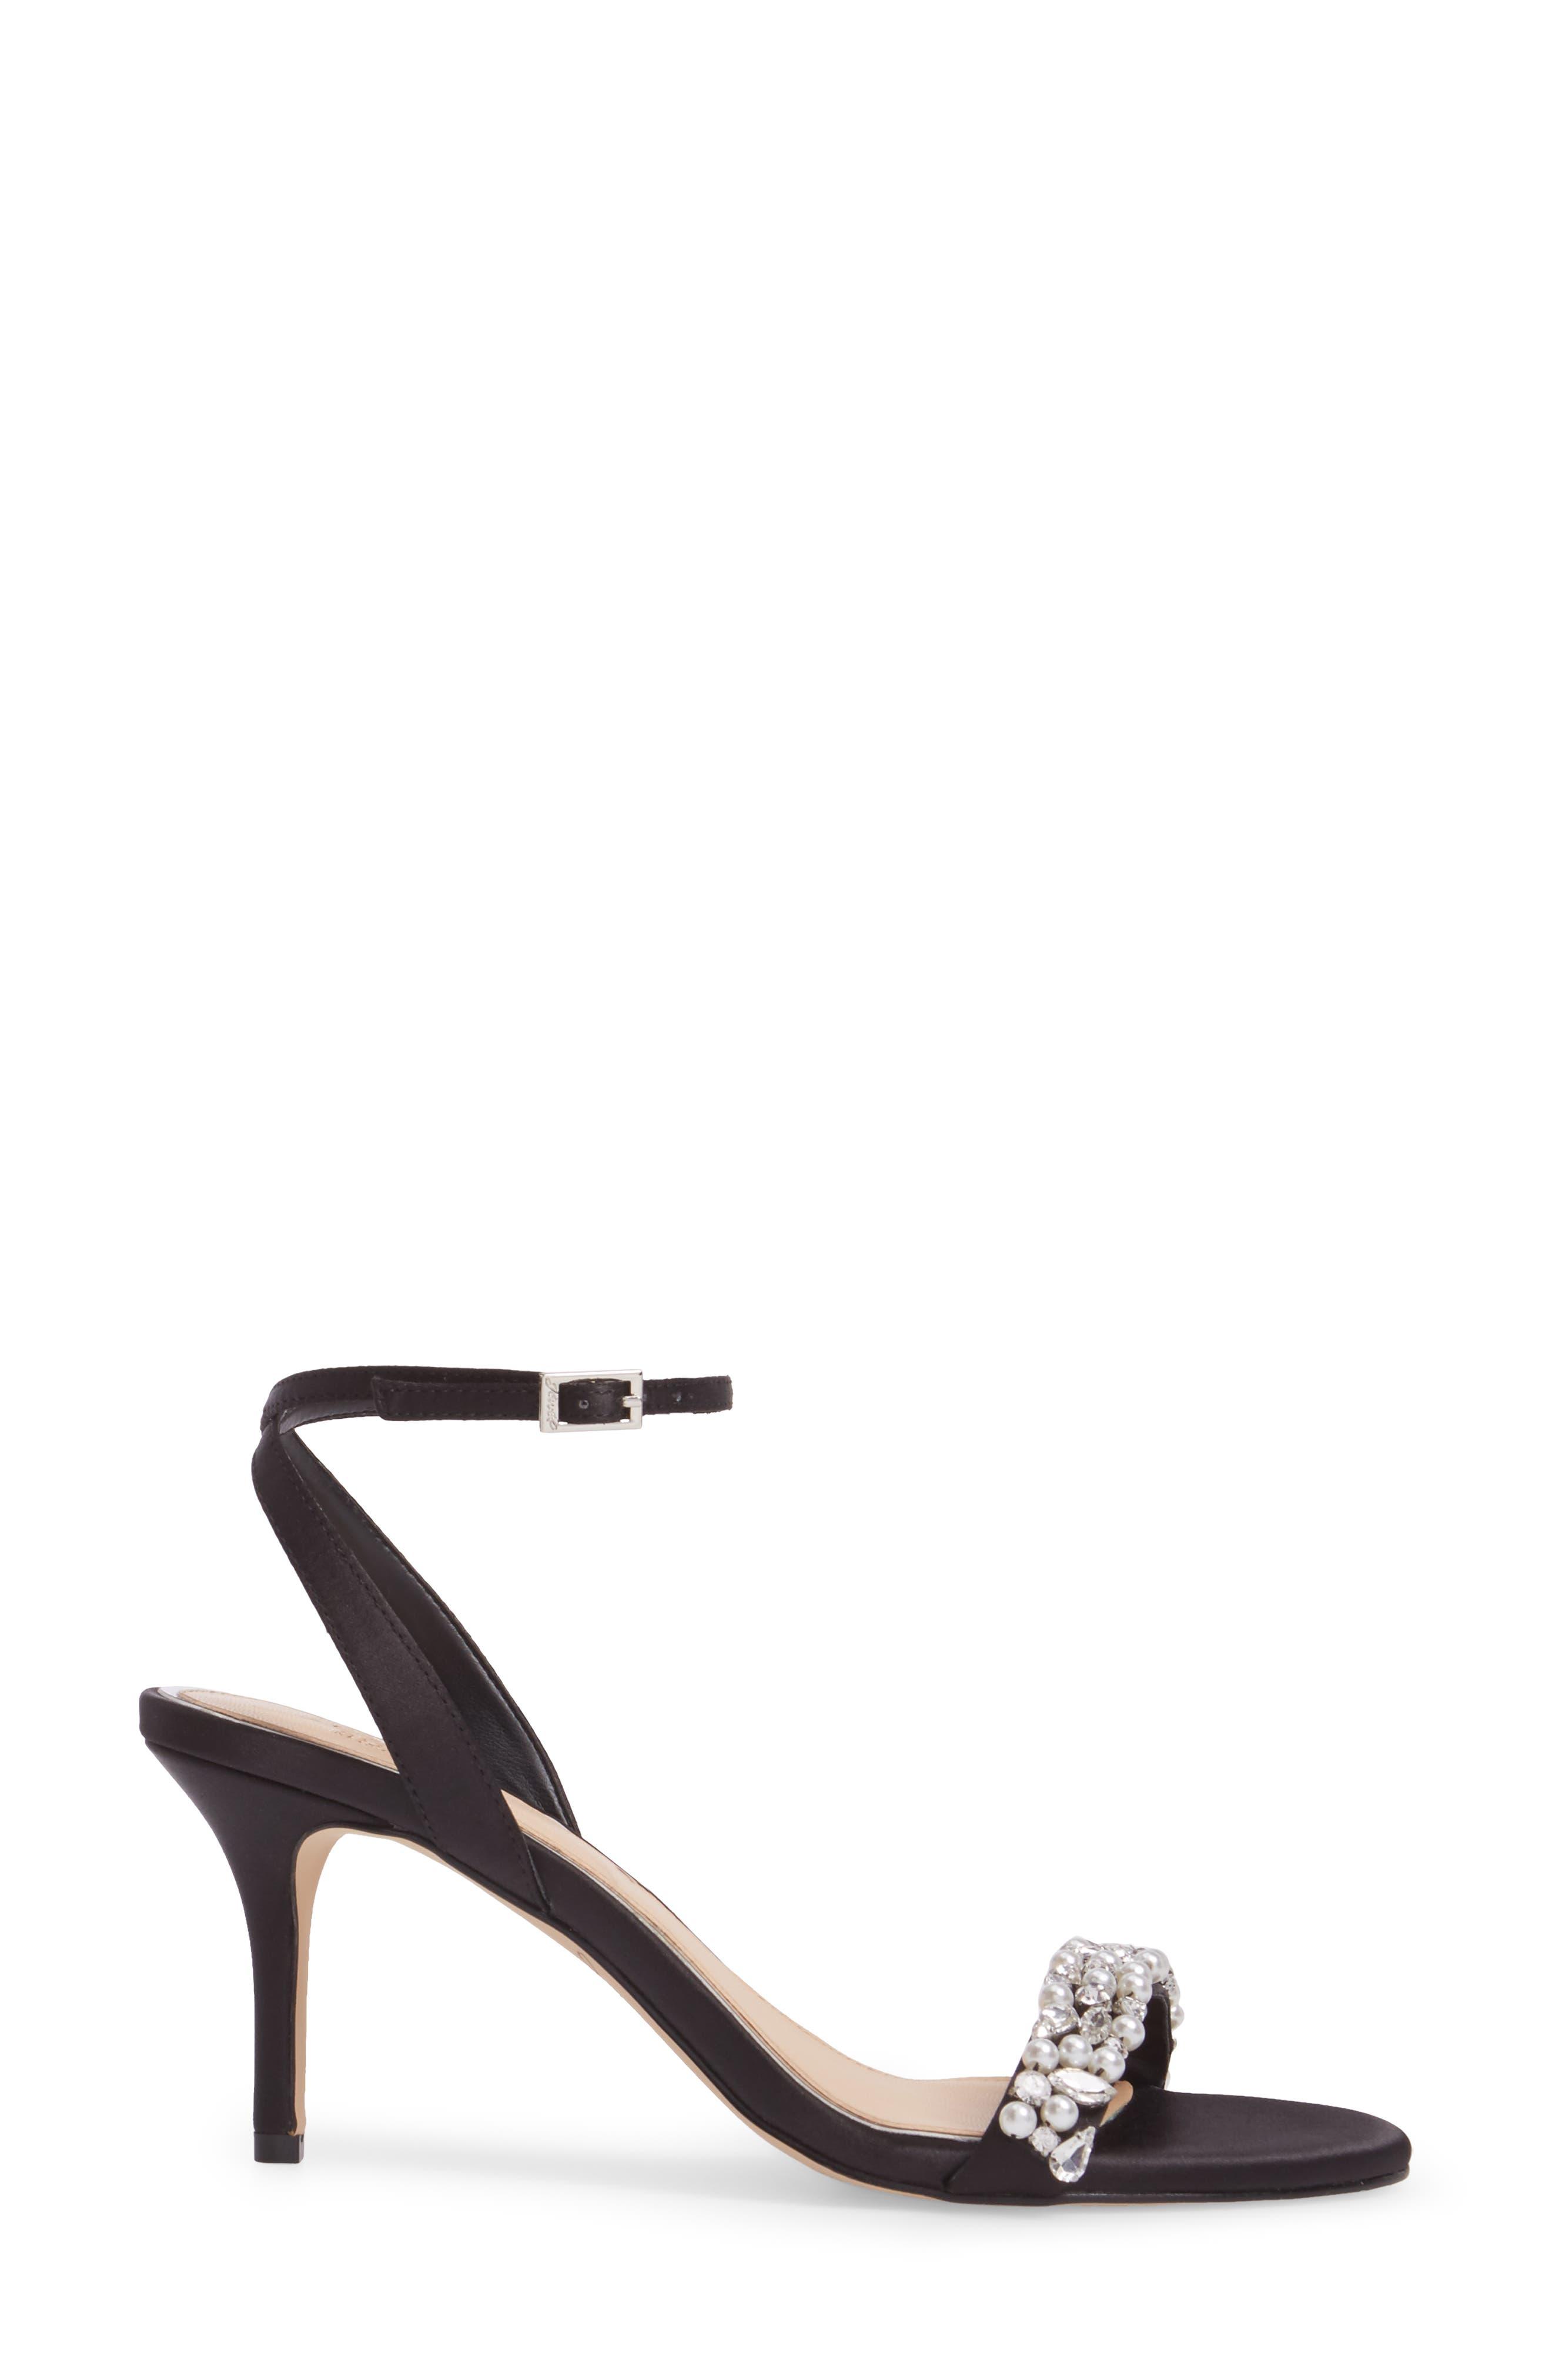 Jewel by Badgley Mischka Theodora Ankle Strap Sandal,                             Alternate thumbnail 3, color,                             Black Satin